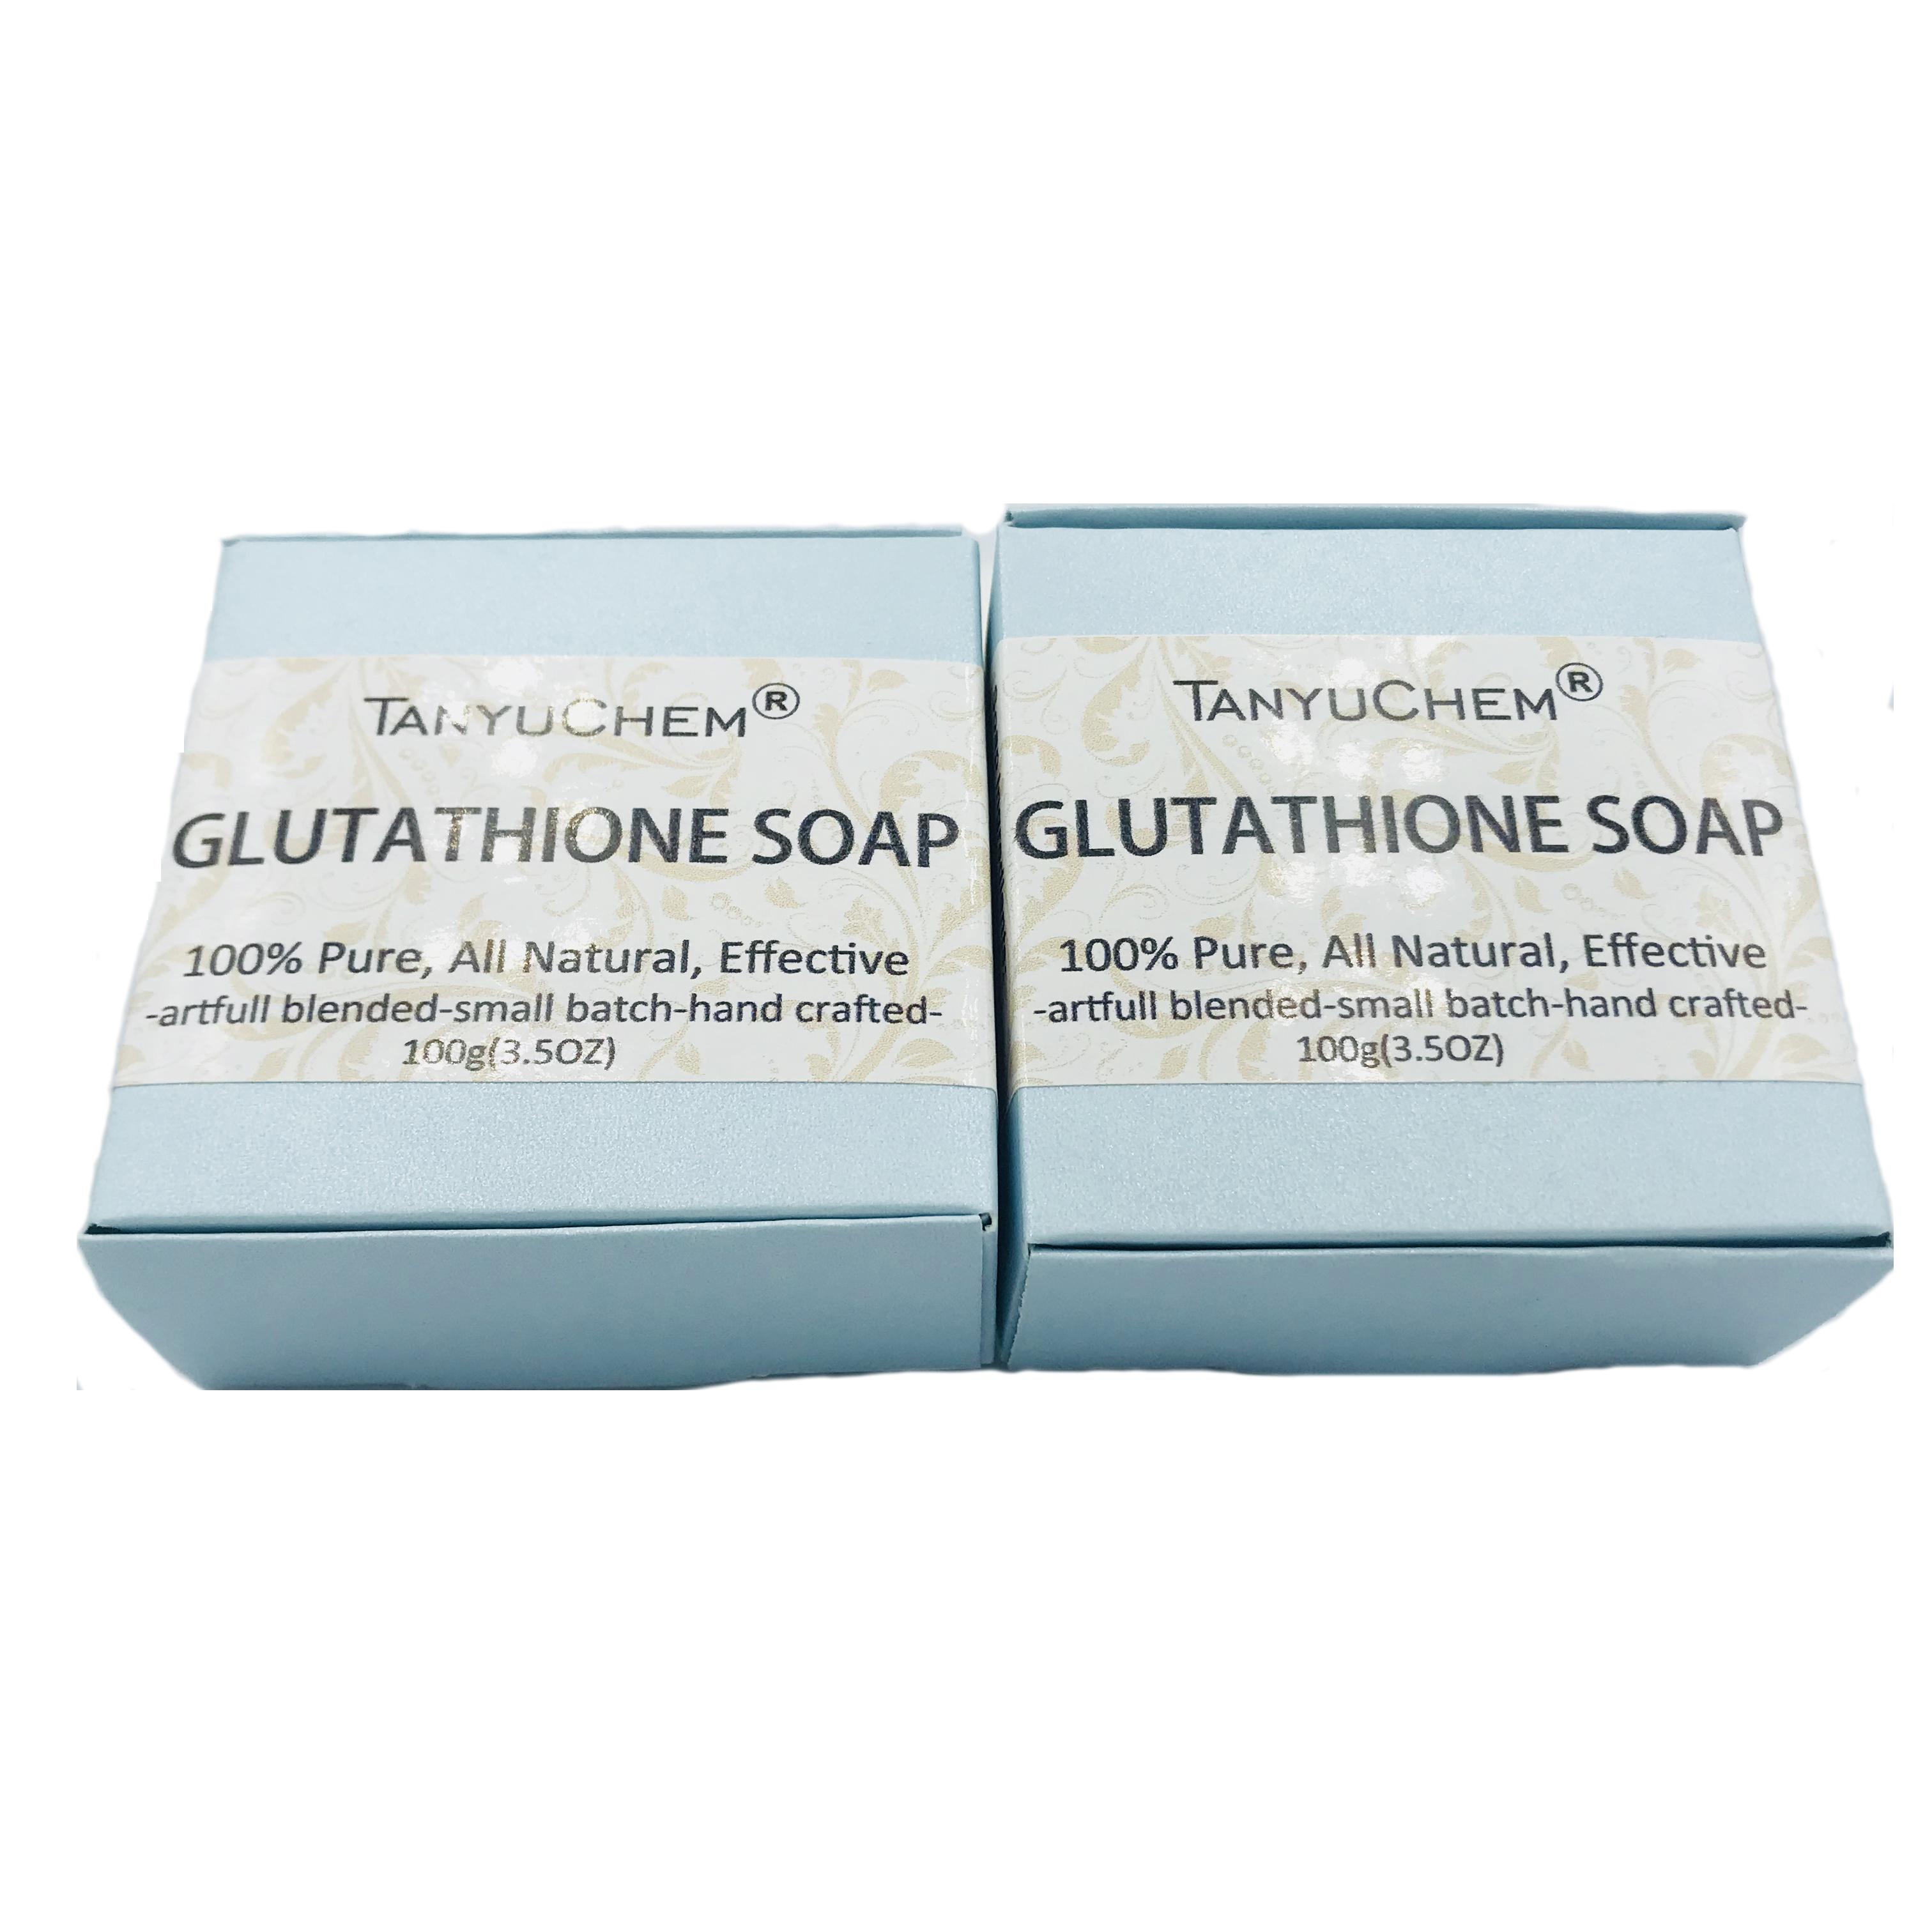 Private Label Skin Brightening and Moisturizing Goat Milk Glutathione Soap